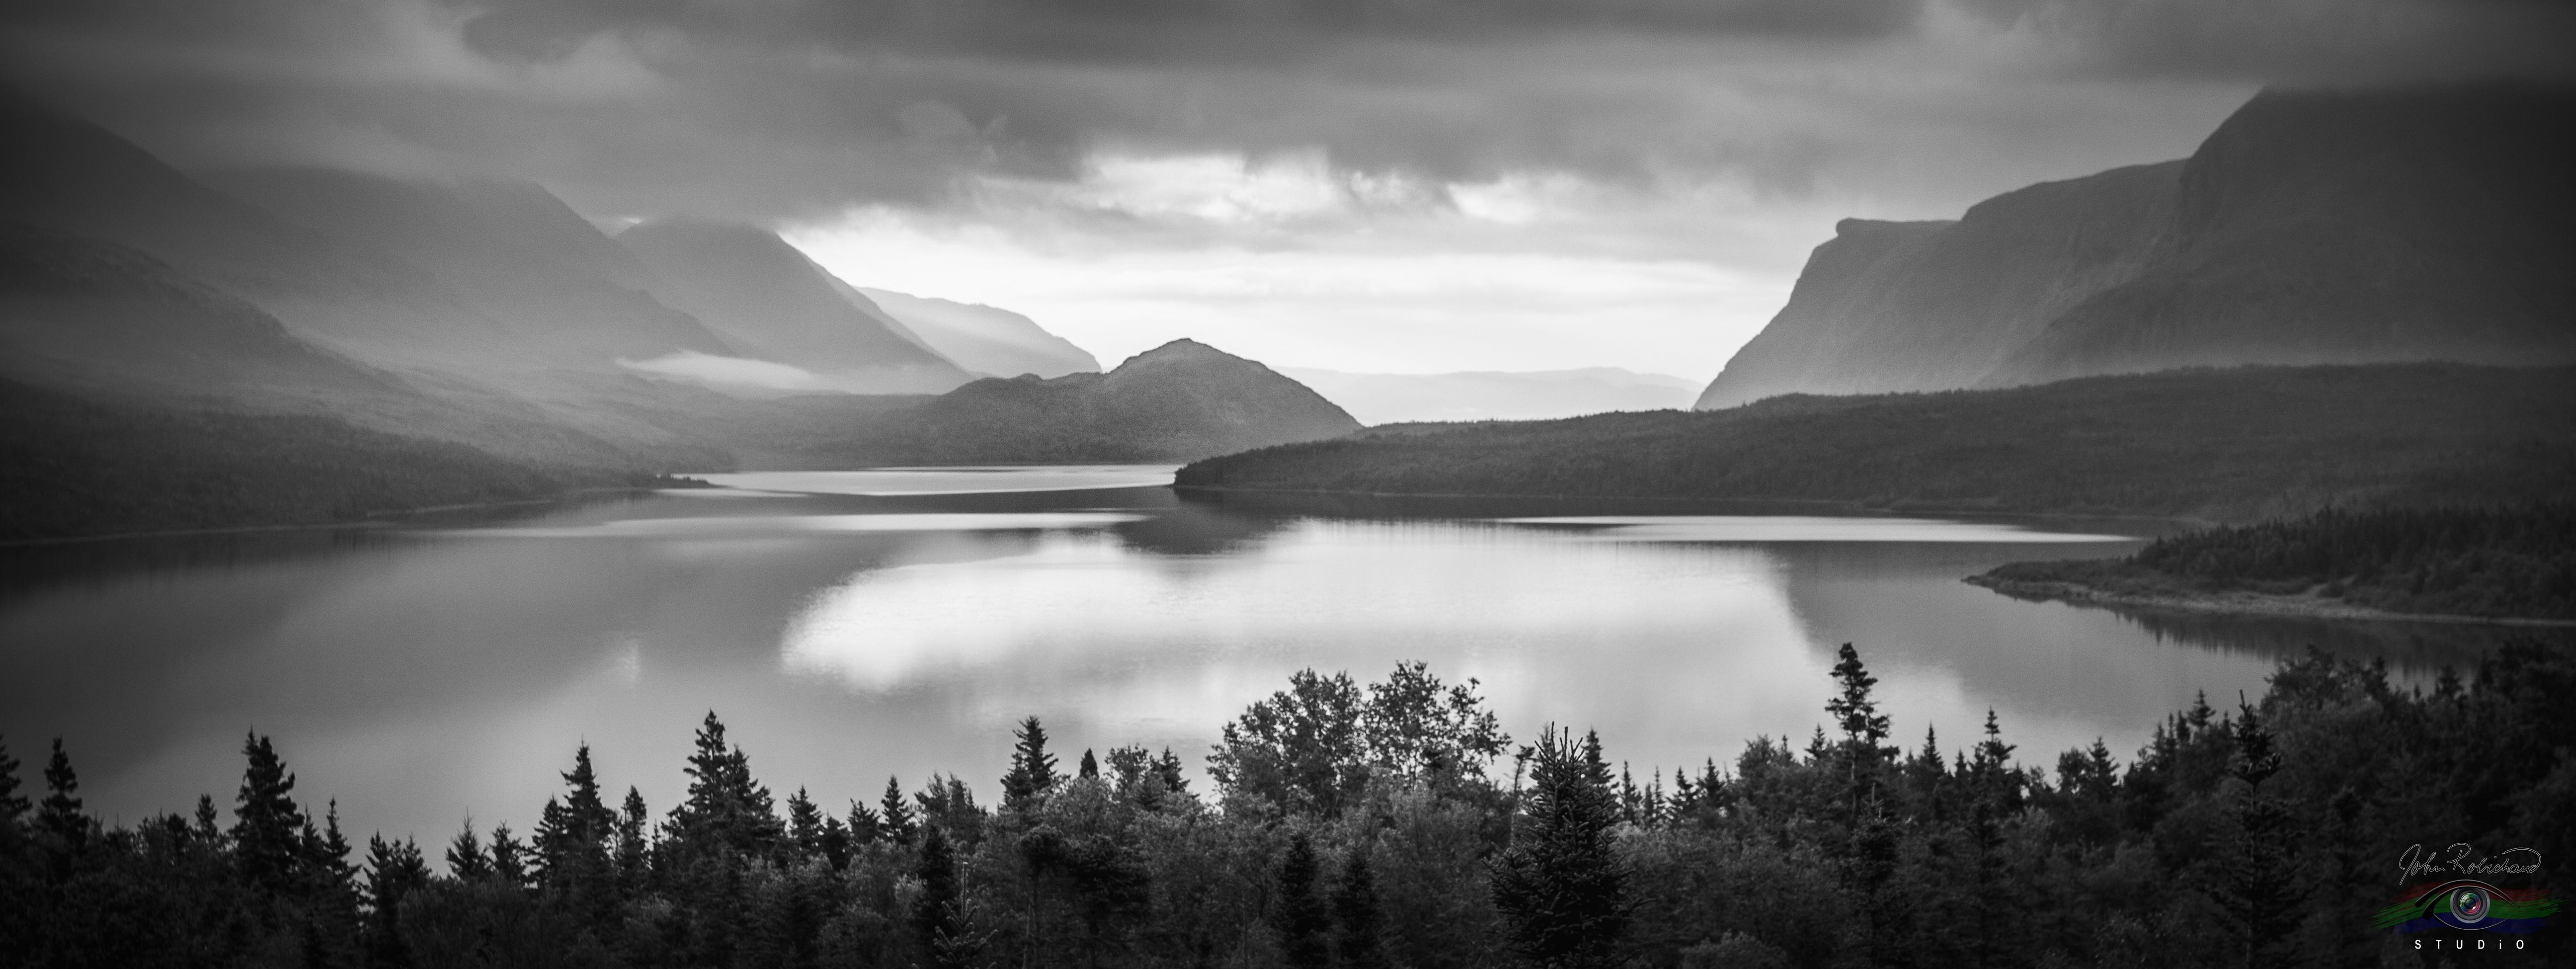 Gros Morne Morn by John Robichaud